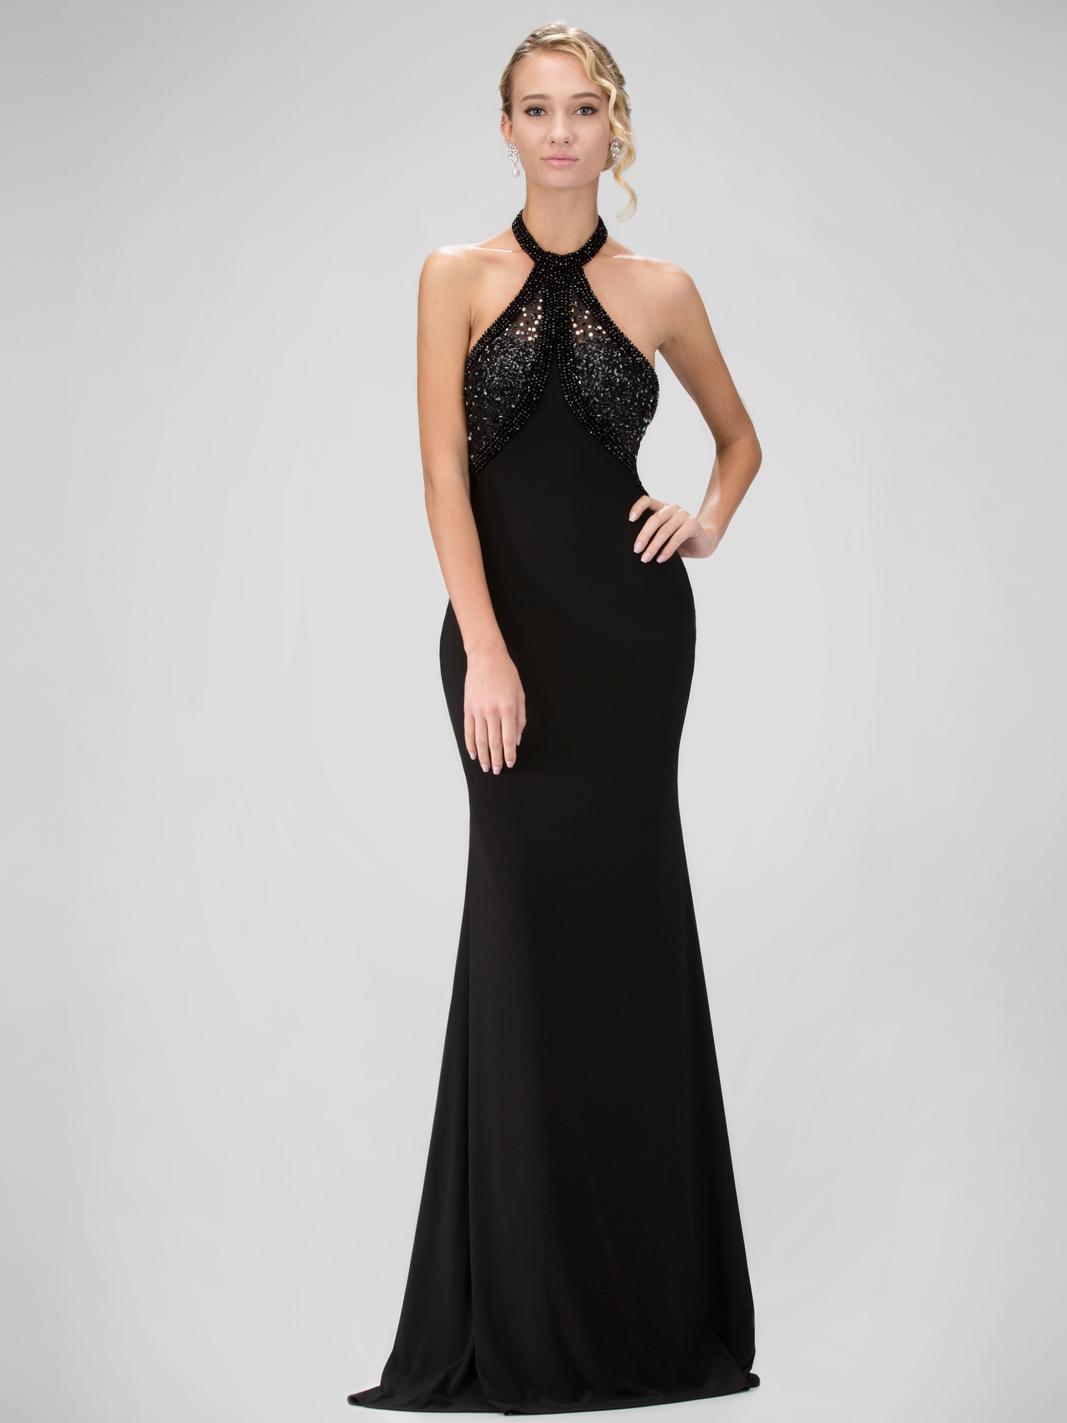 Halter V-Neck Chiffon Long Prom Dress - PromGirl  |Halter Cocktail Dresses